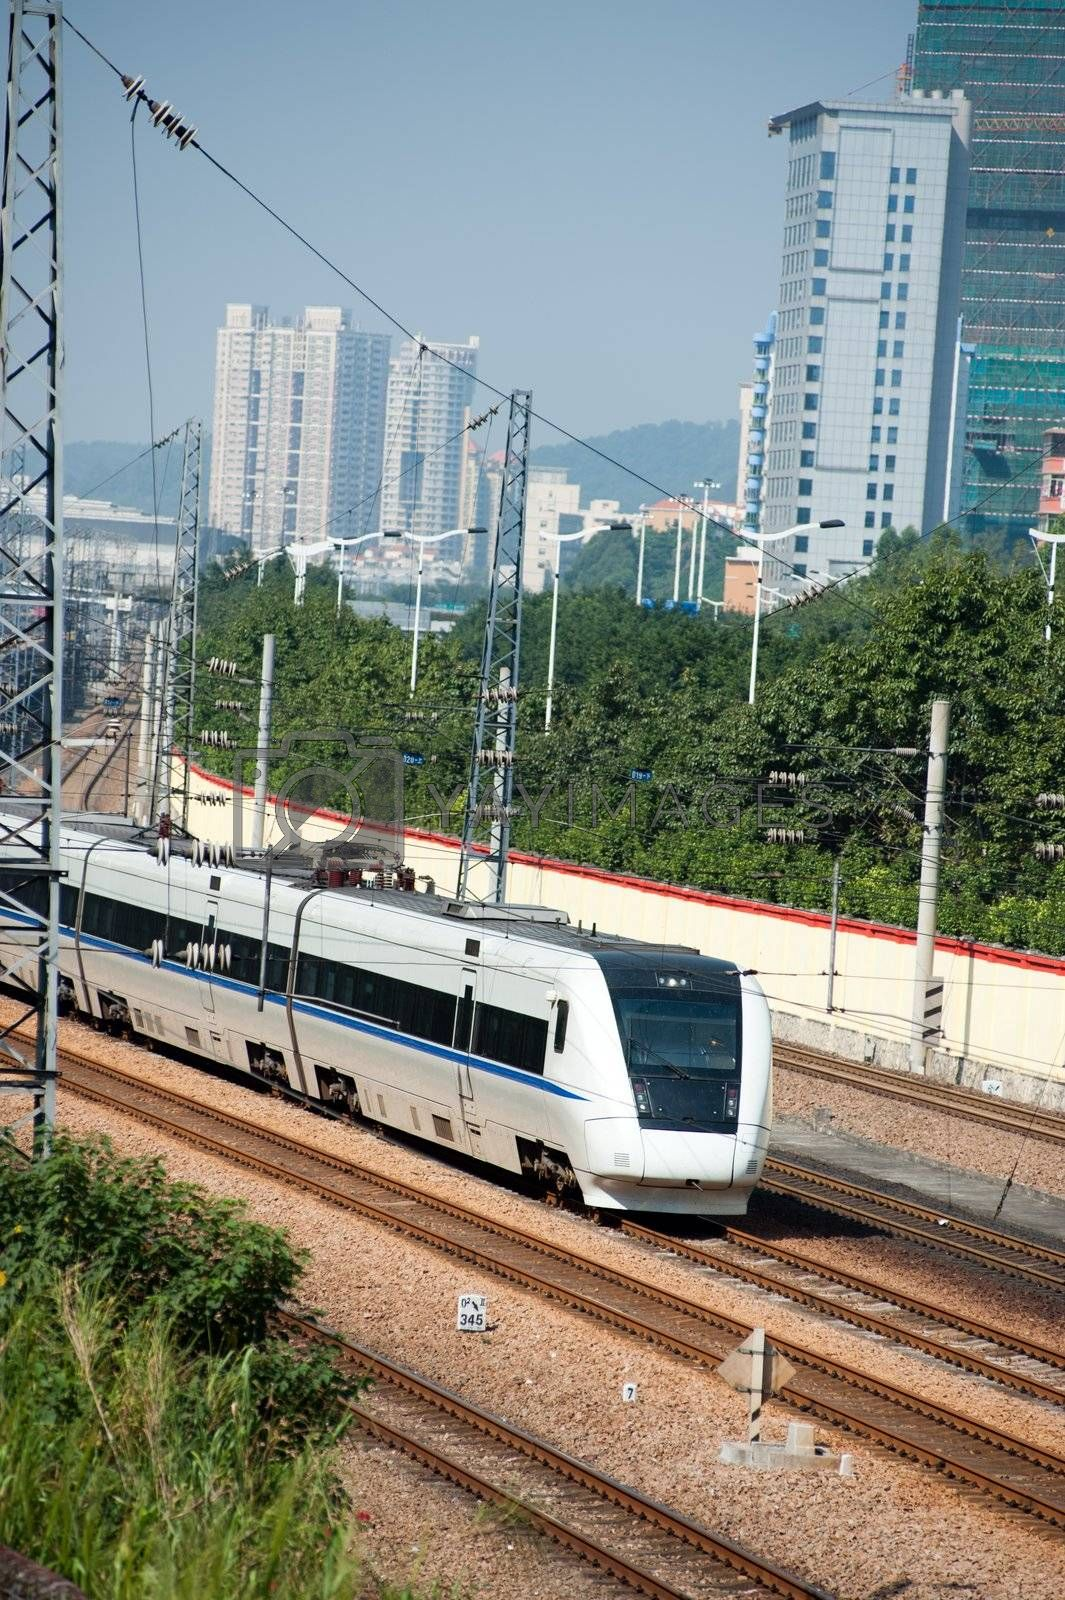 Train running on rail in Canton, China